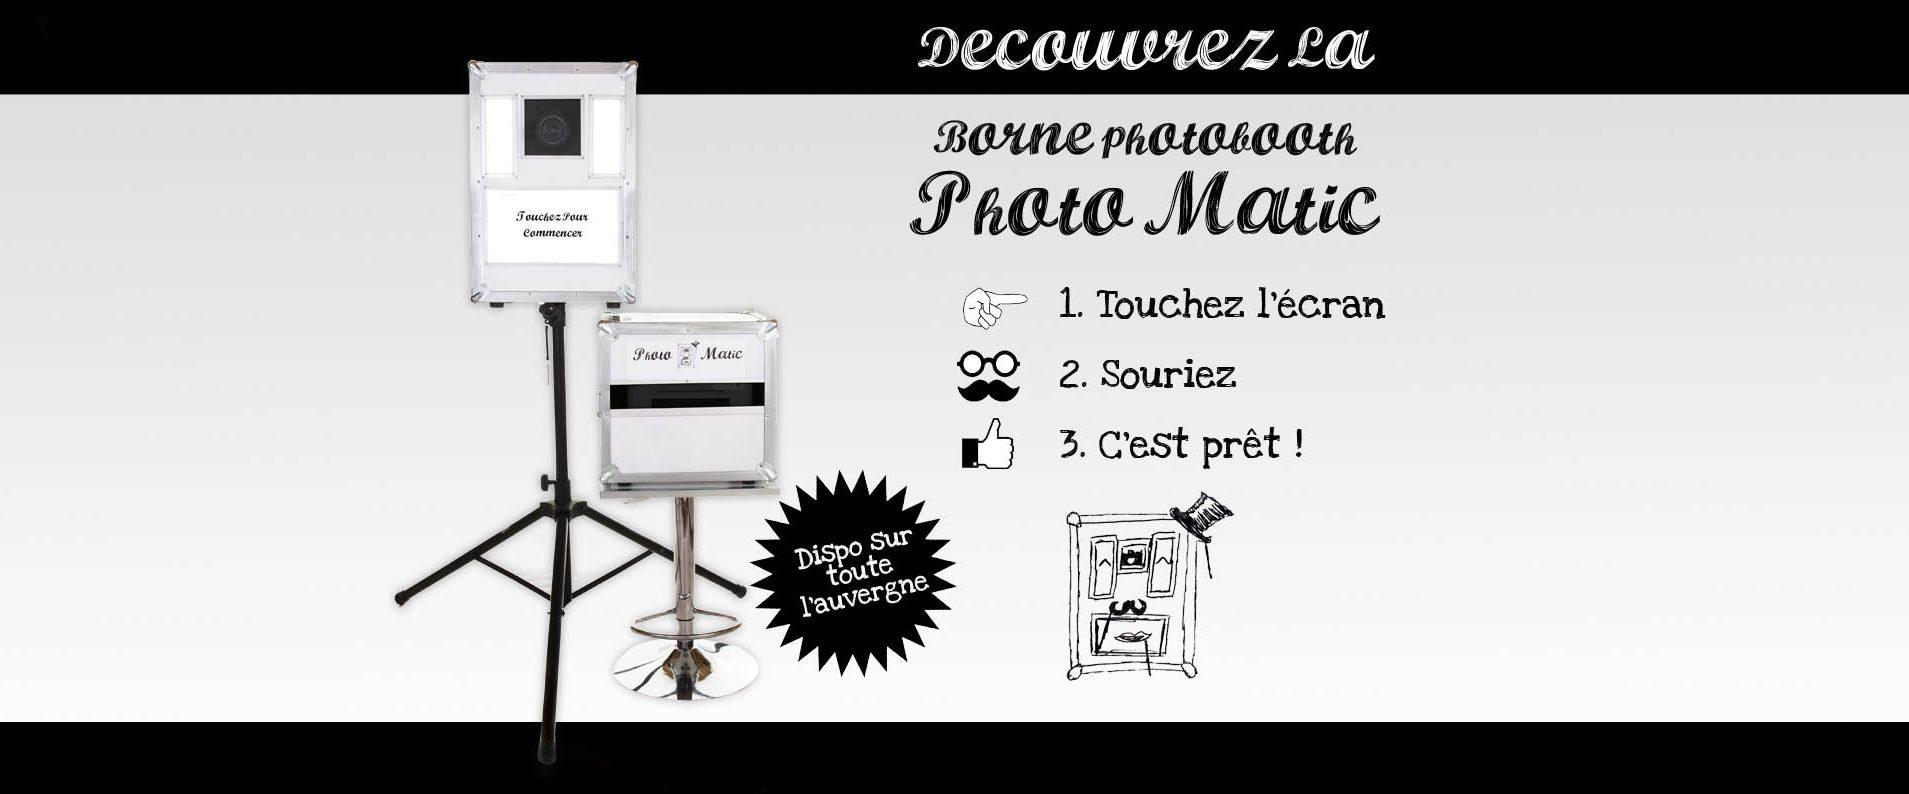 location borne photobooth auvergne la borne photo maticphoto matic location borne. Black Bedroom Furniture Sets. Home Design Ideas